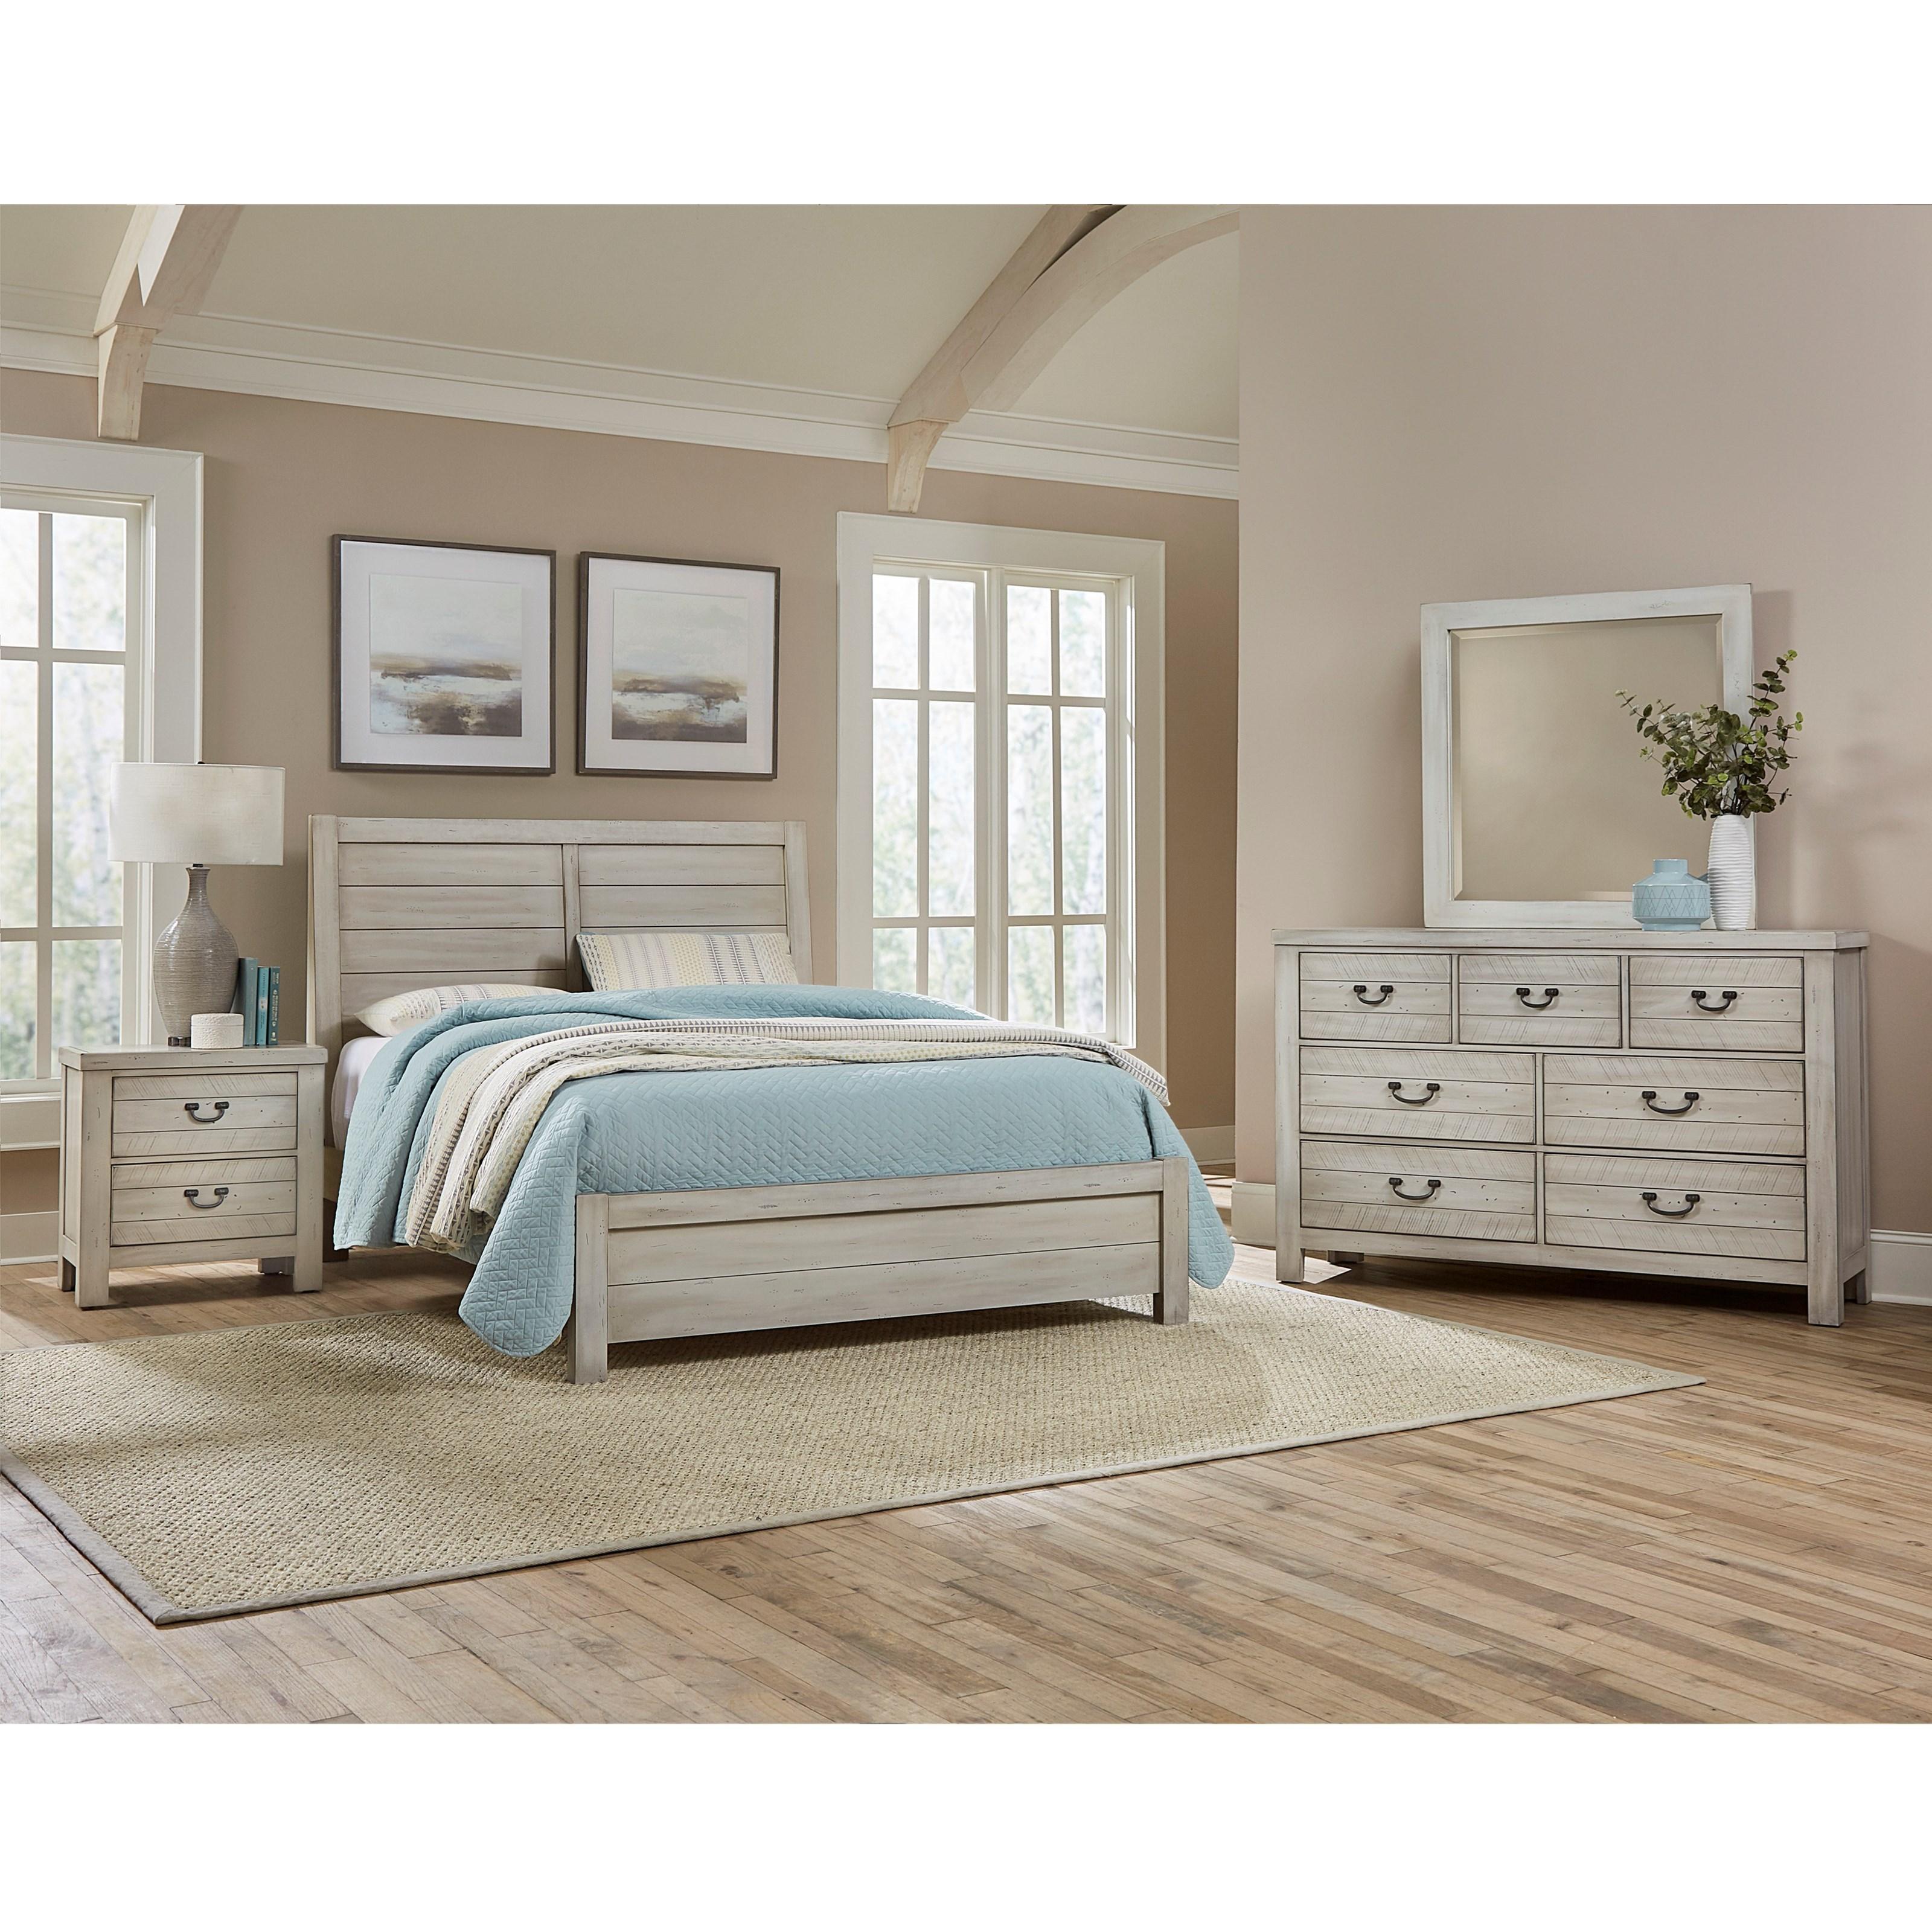 Bassett Furniture Jacksonville Fl: Vaughan Bassett Urban Crossings Queen Bedroom Group